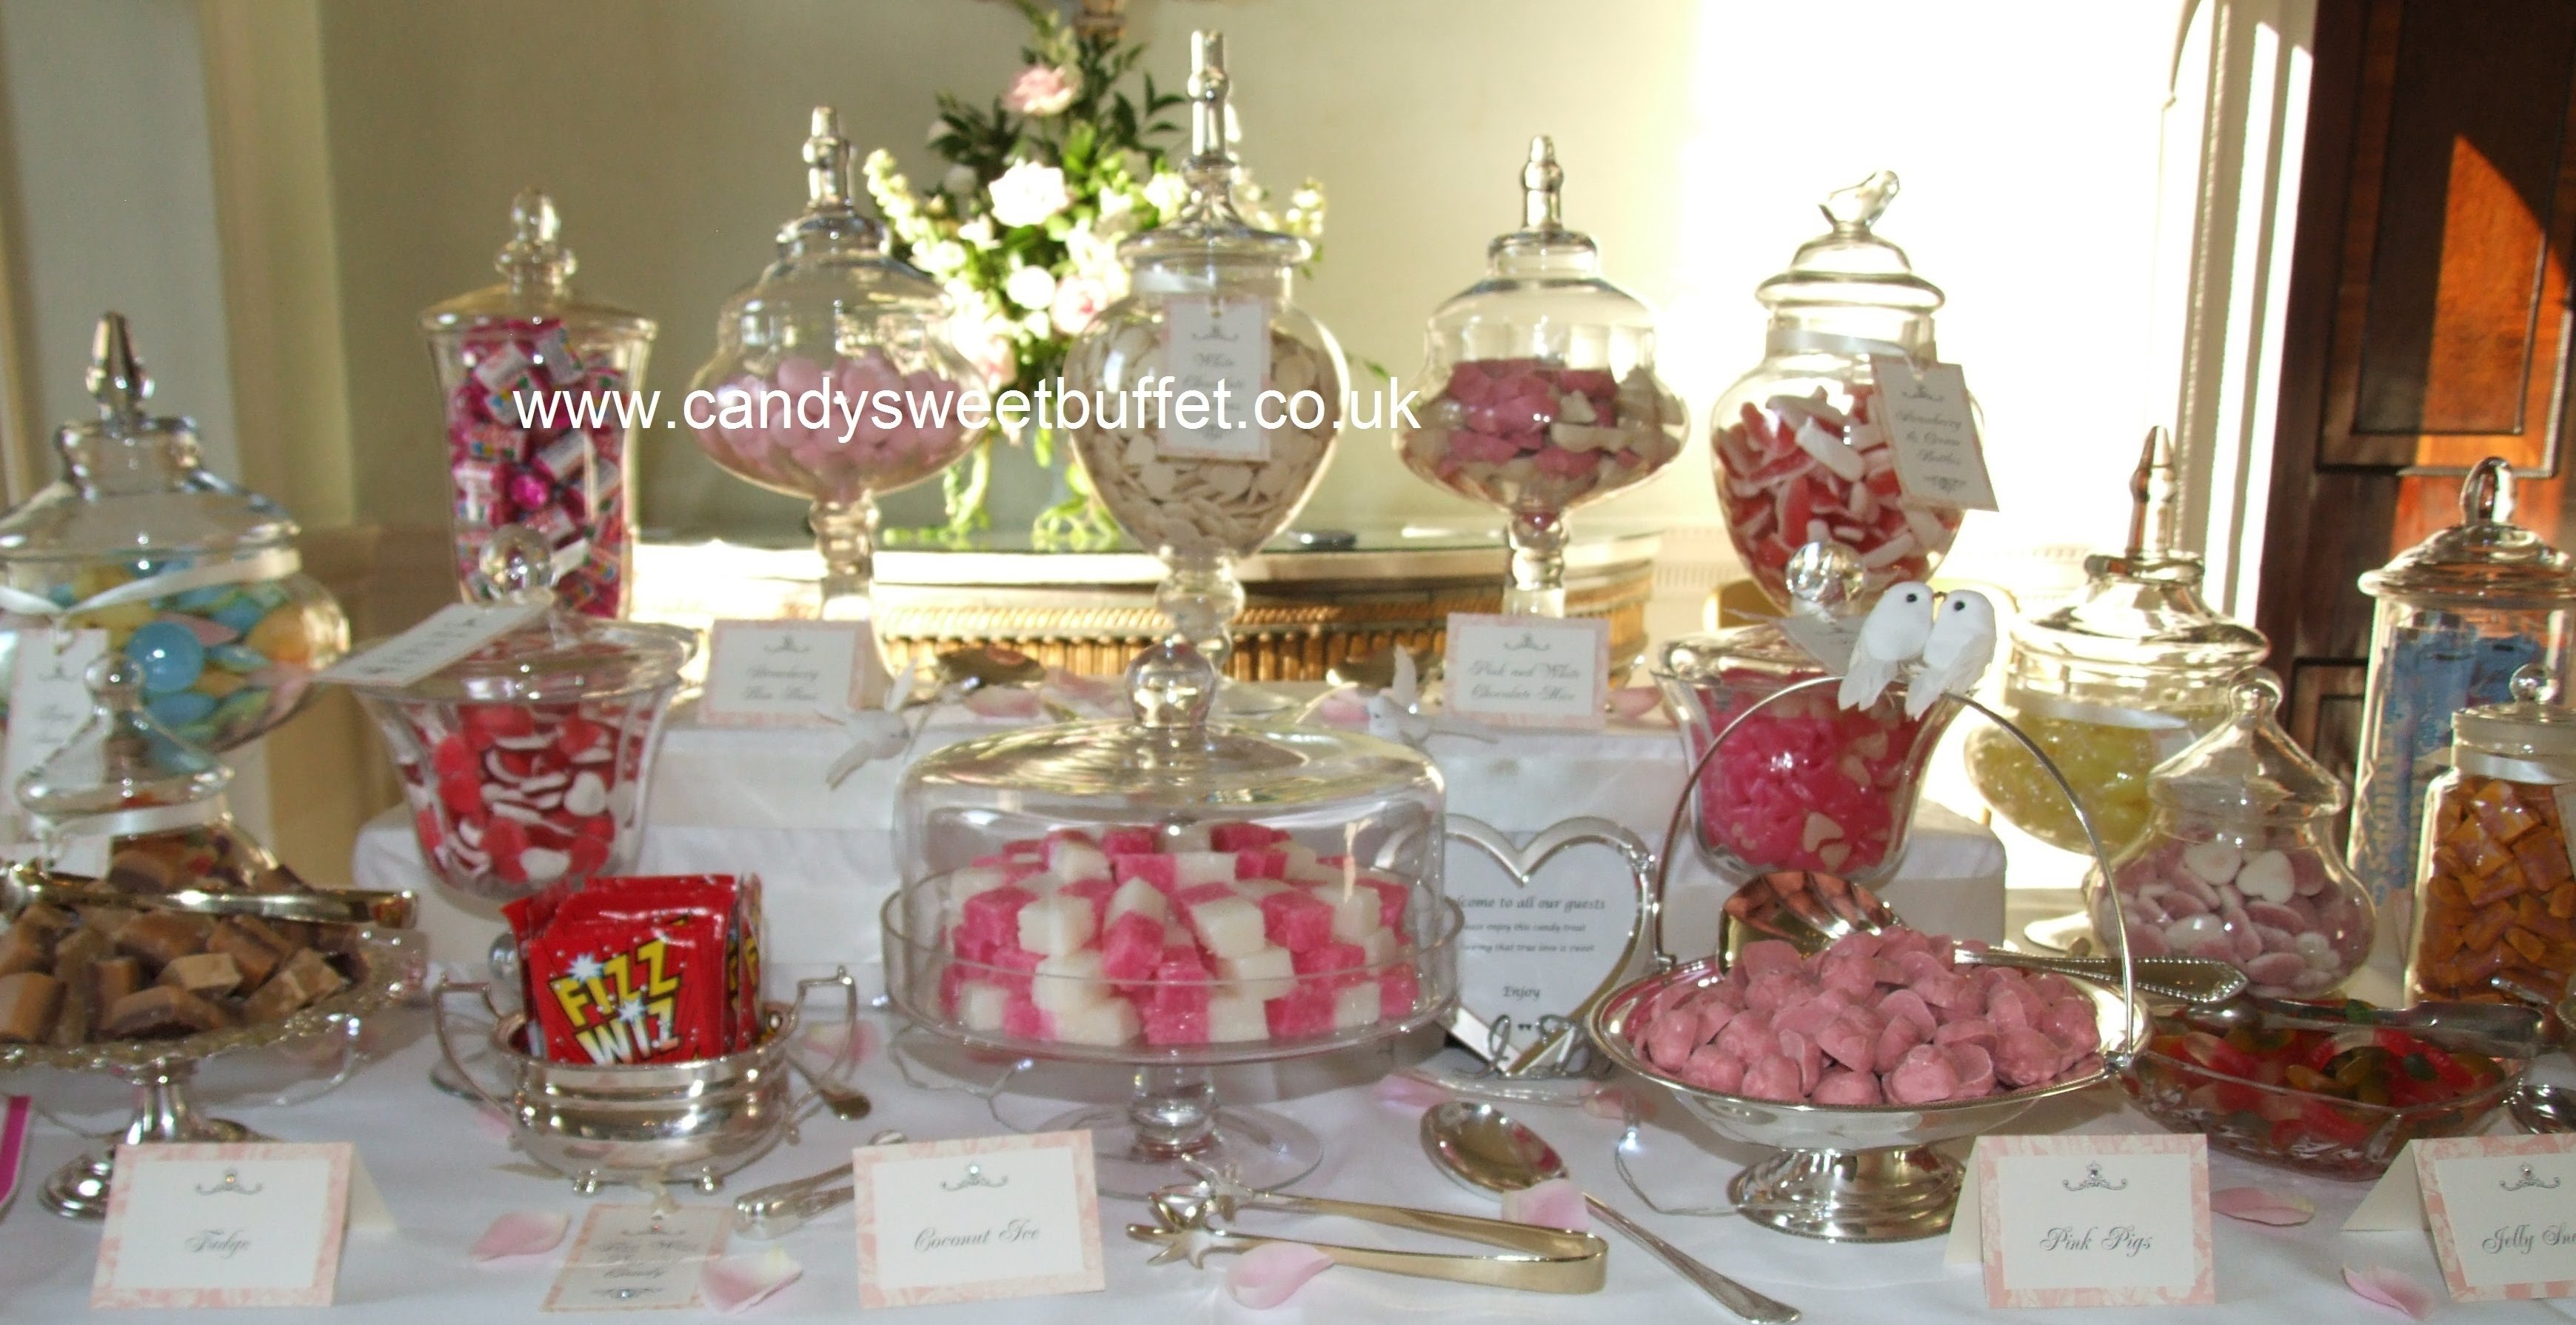 10 Amazing Candy Bar Ideas For Weddings wedding candy sweet buffet table cart nottingham derby leeds 2020